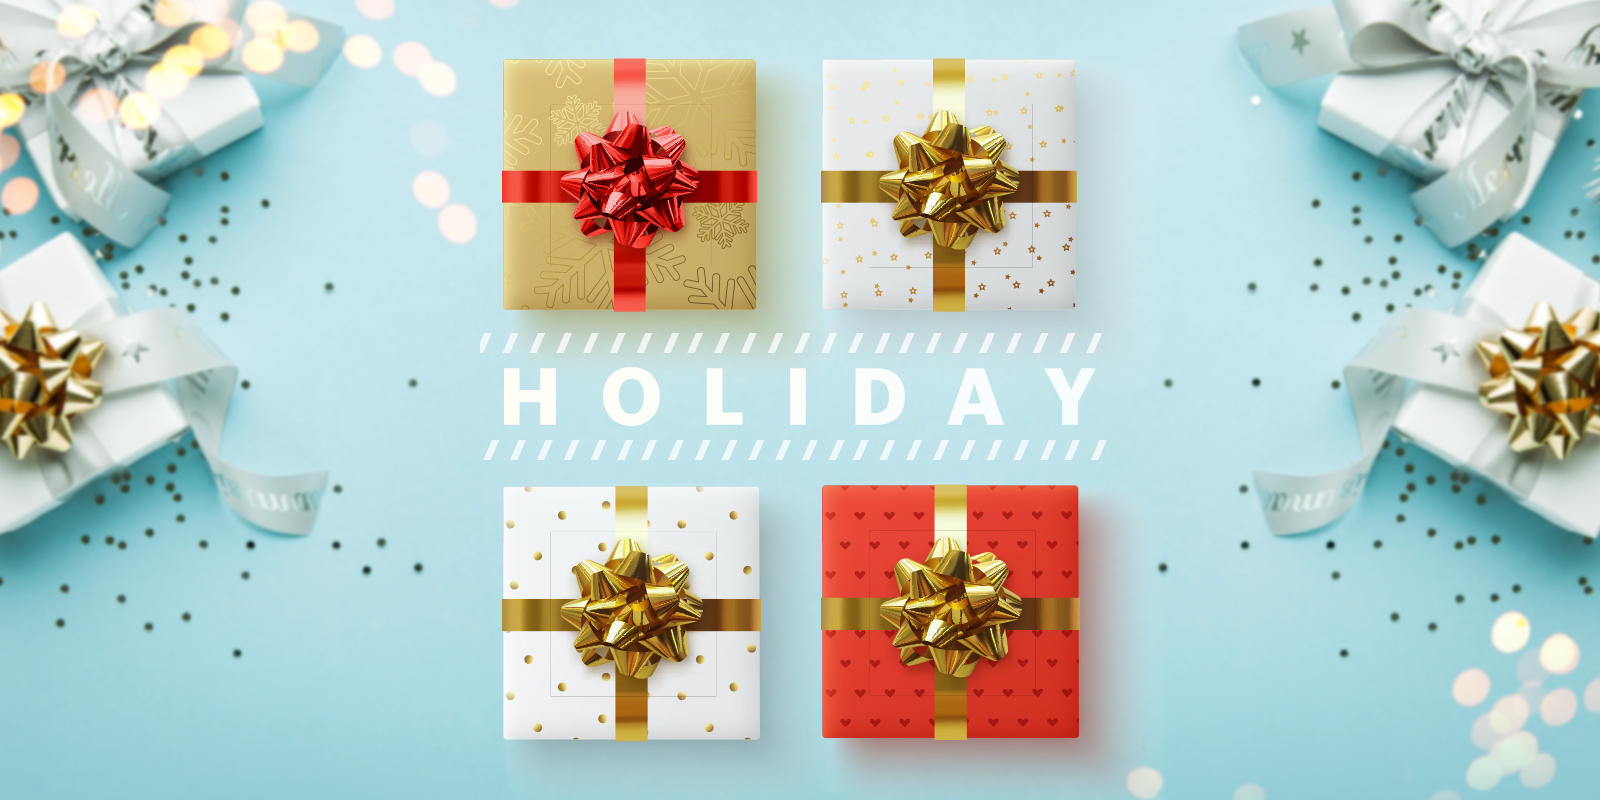 Kickstart your Holiday shopping